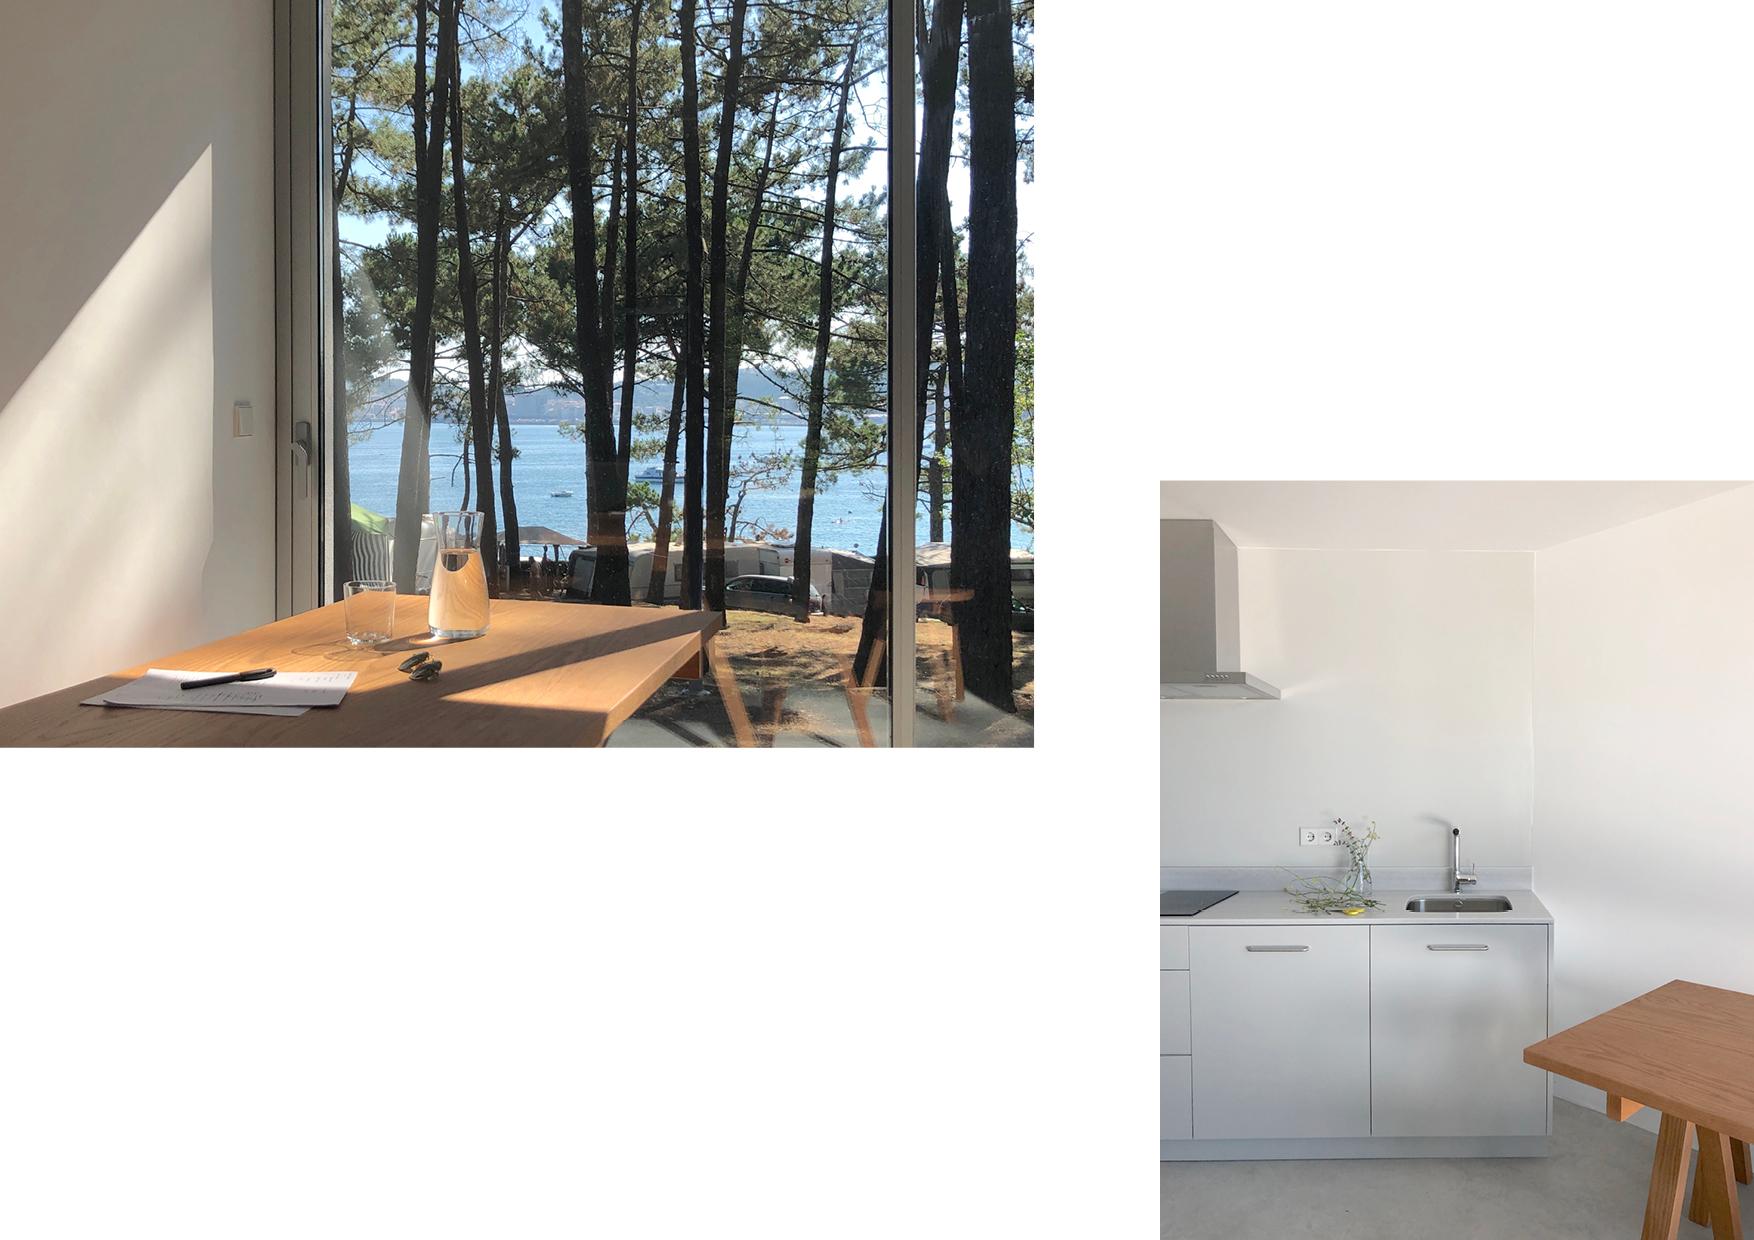 Coroso_Apartamentos de Verano_3.jpg